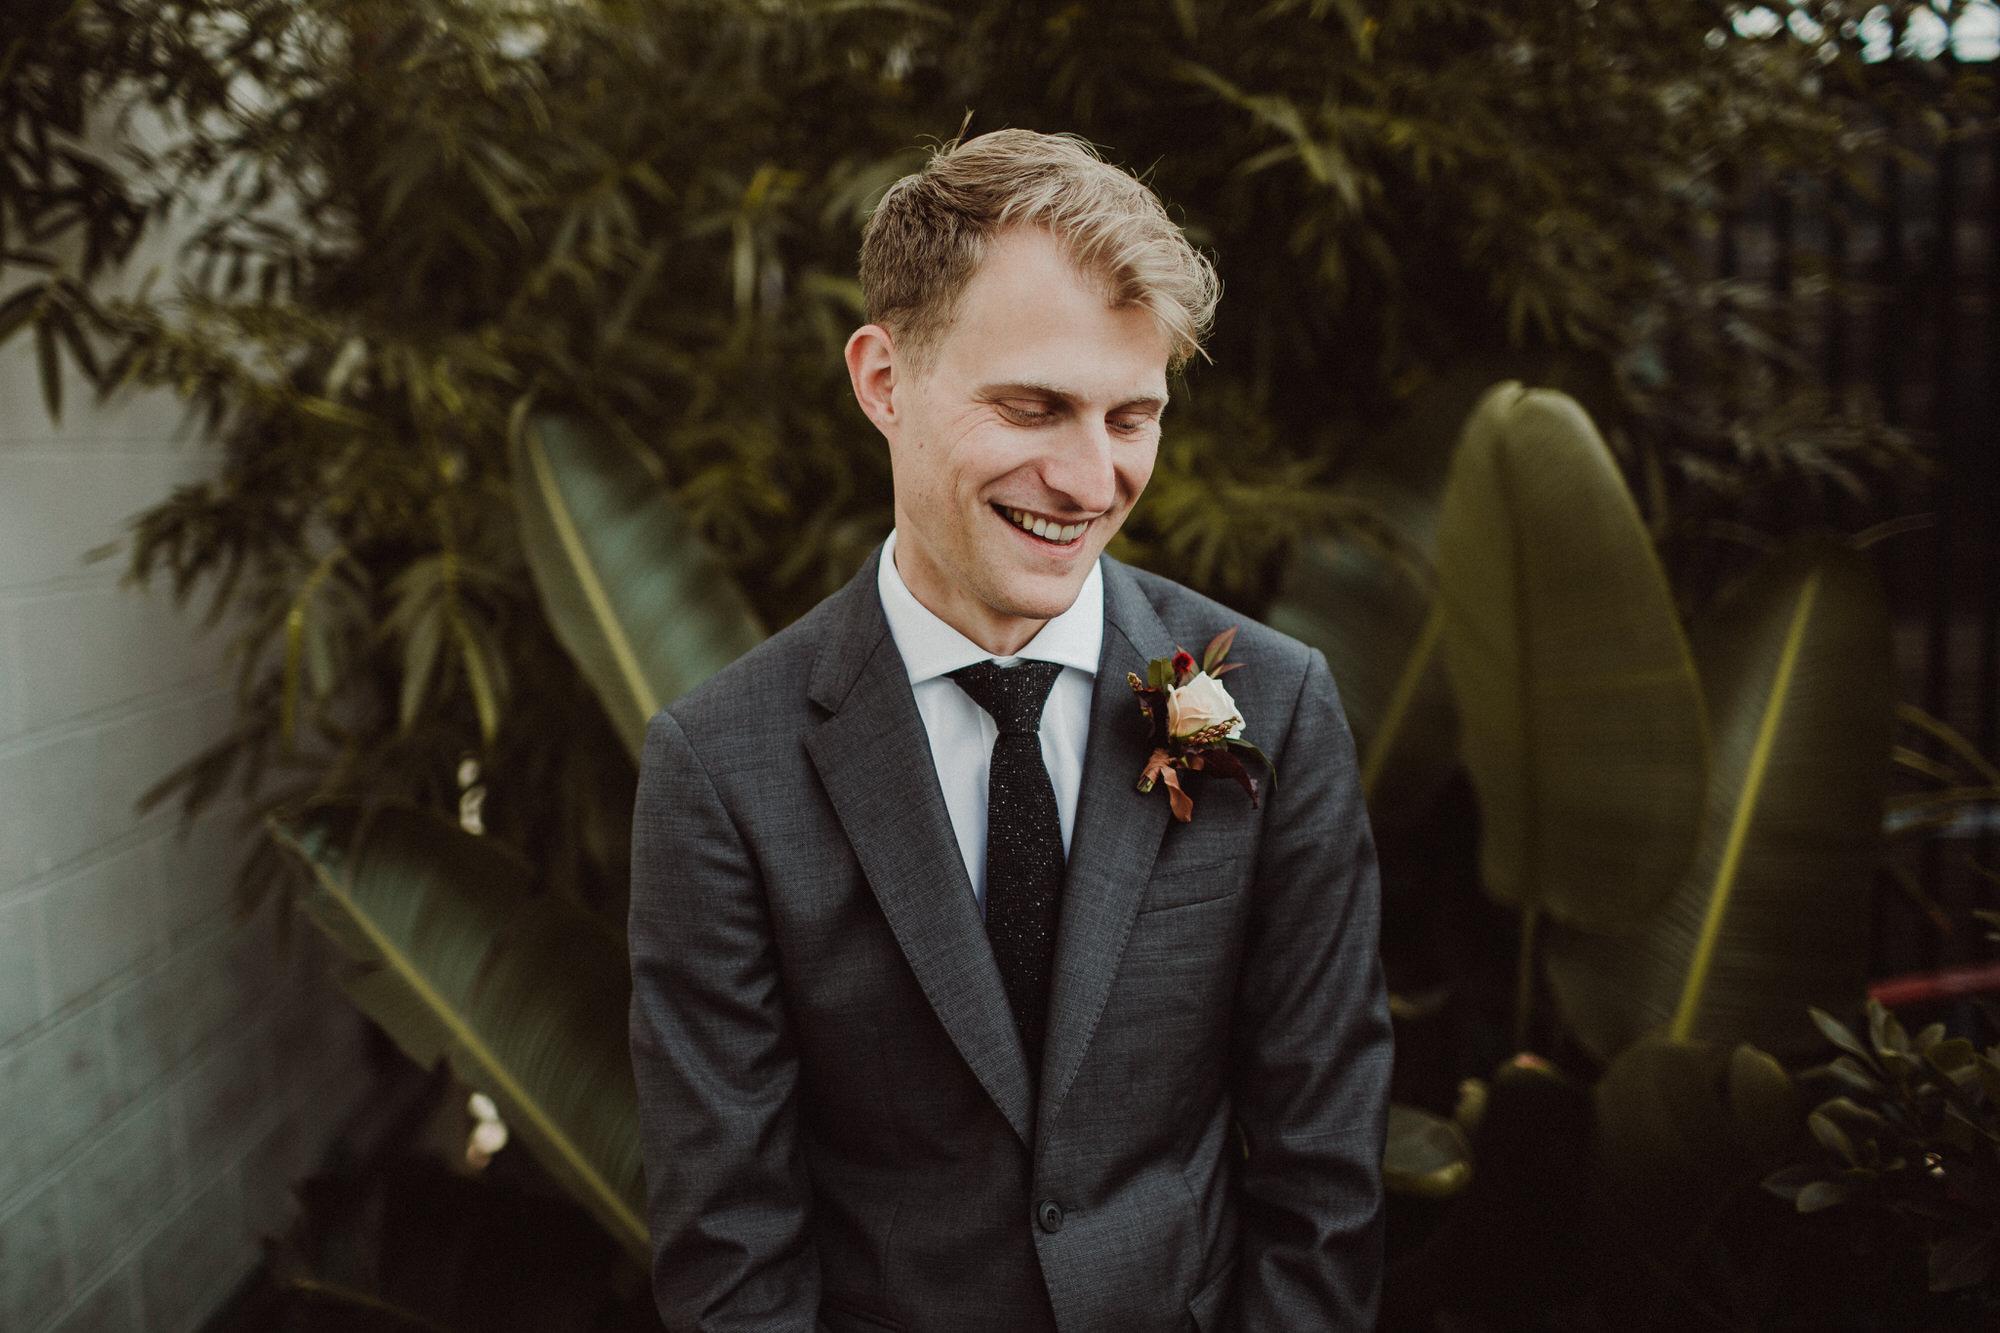 los-angeles-wedding-photographer-millwick-75.jpg